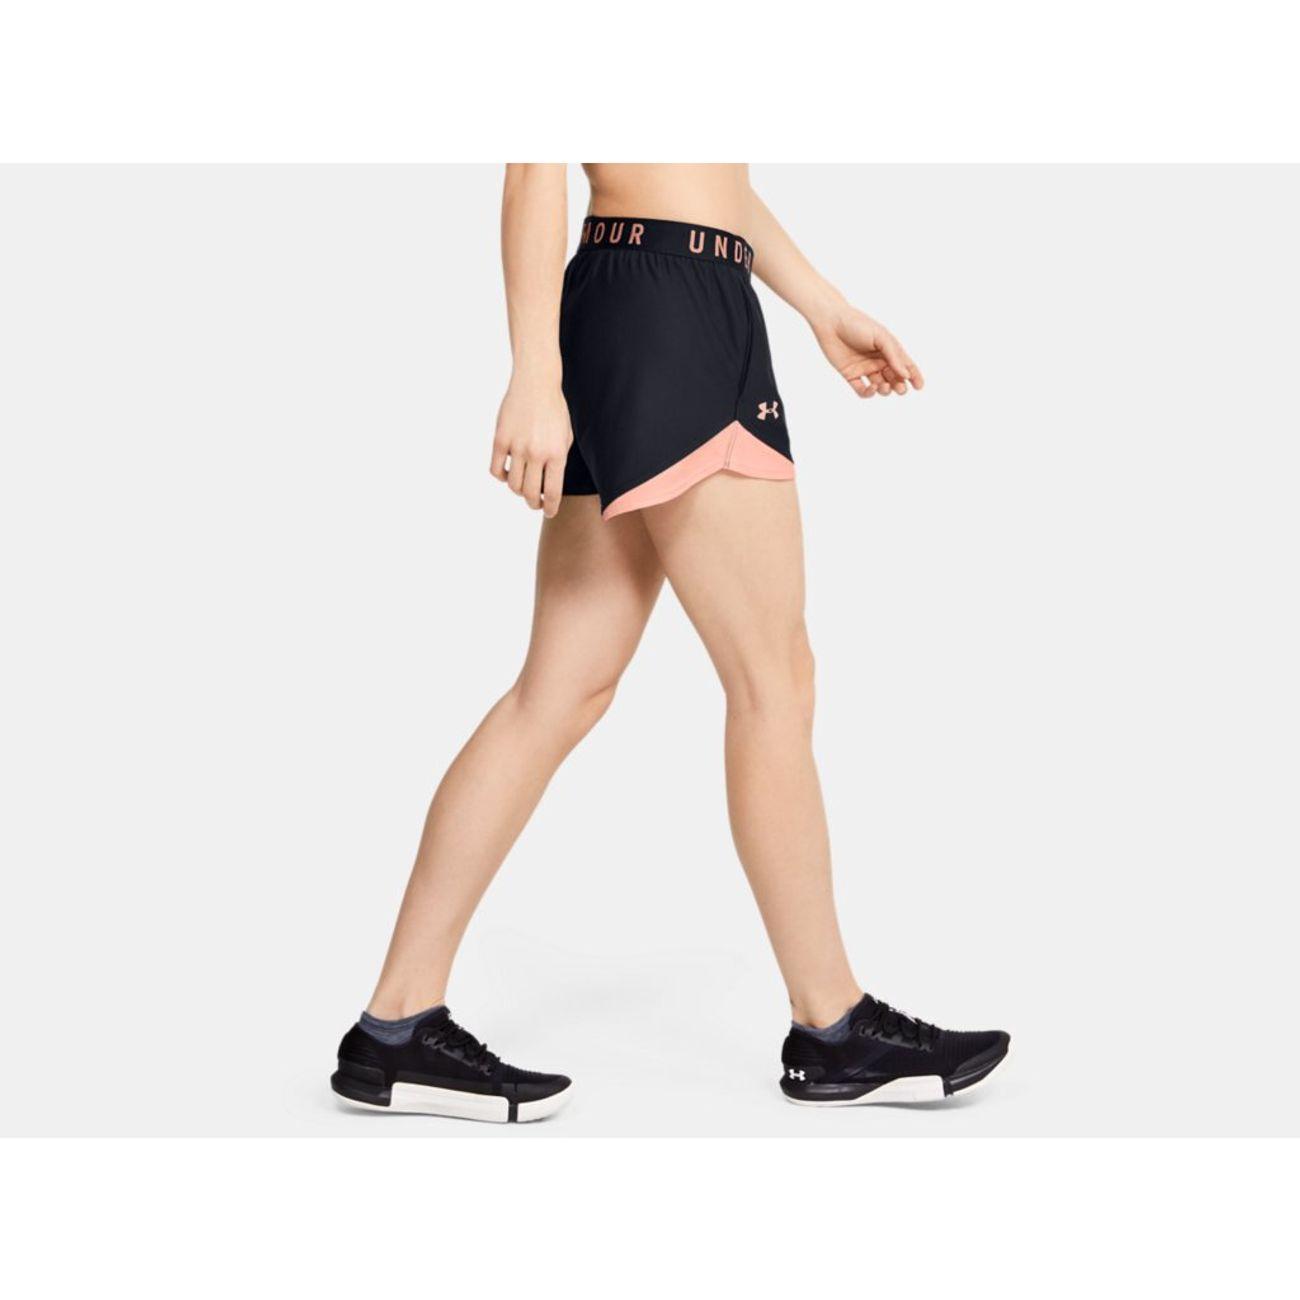 Fitness femme UNDER ARMOUR Short femme Under Armour Play Up 3.0